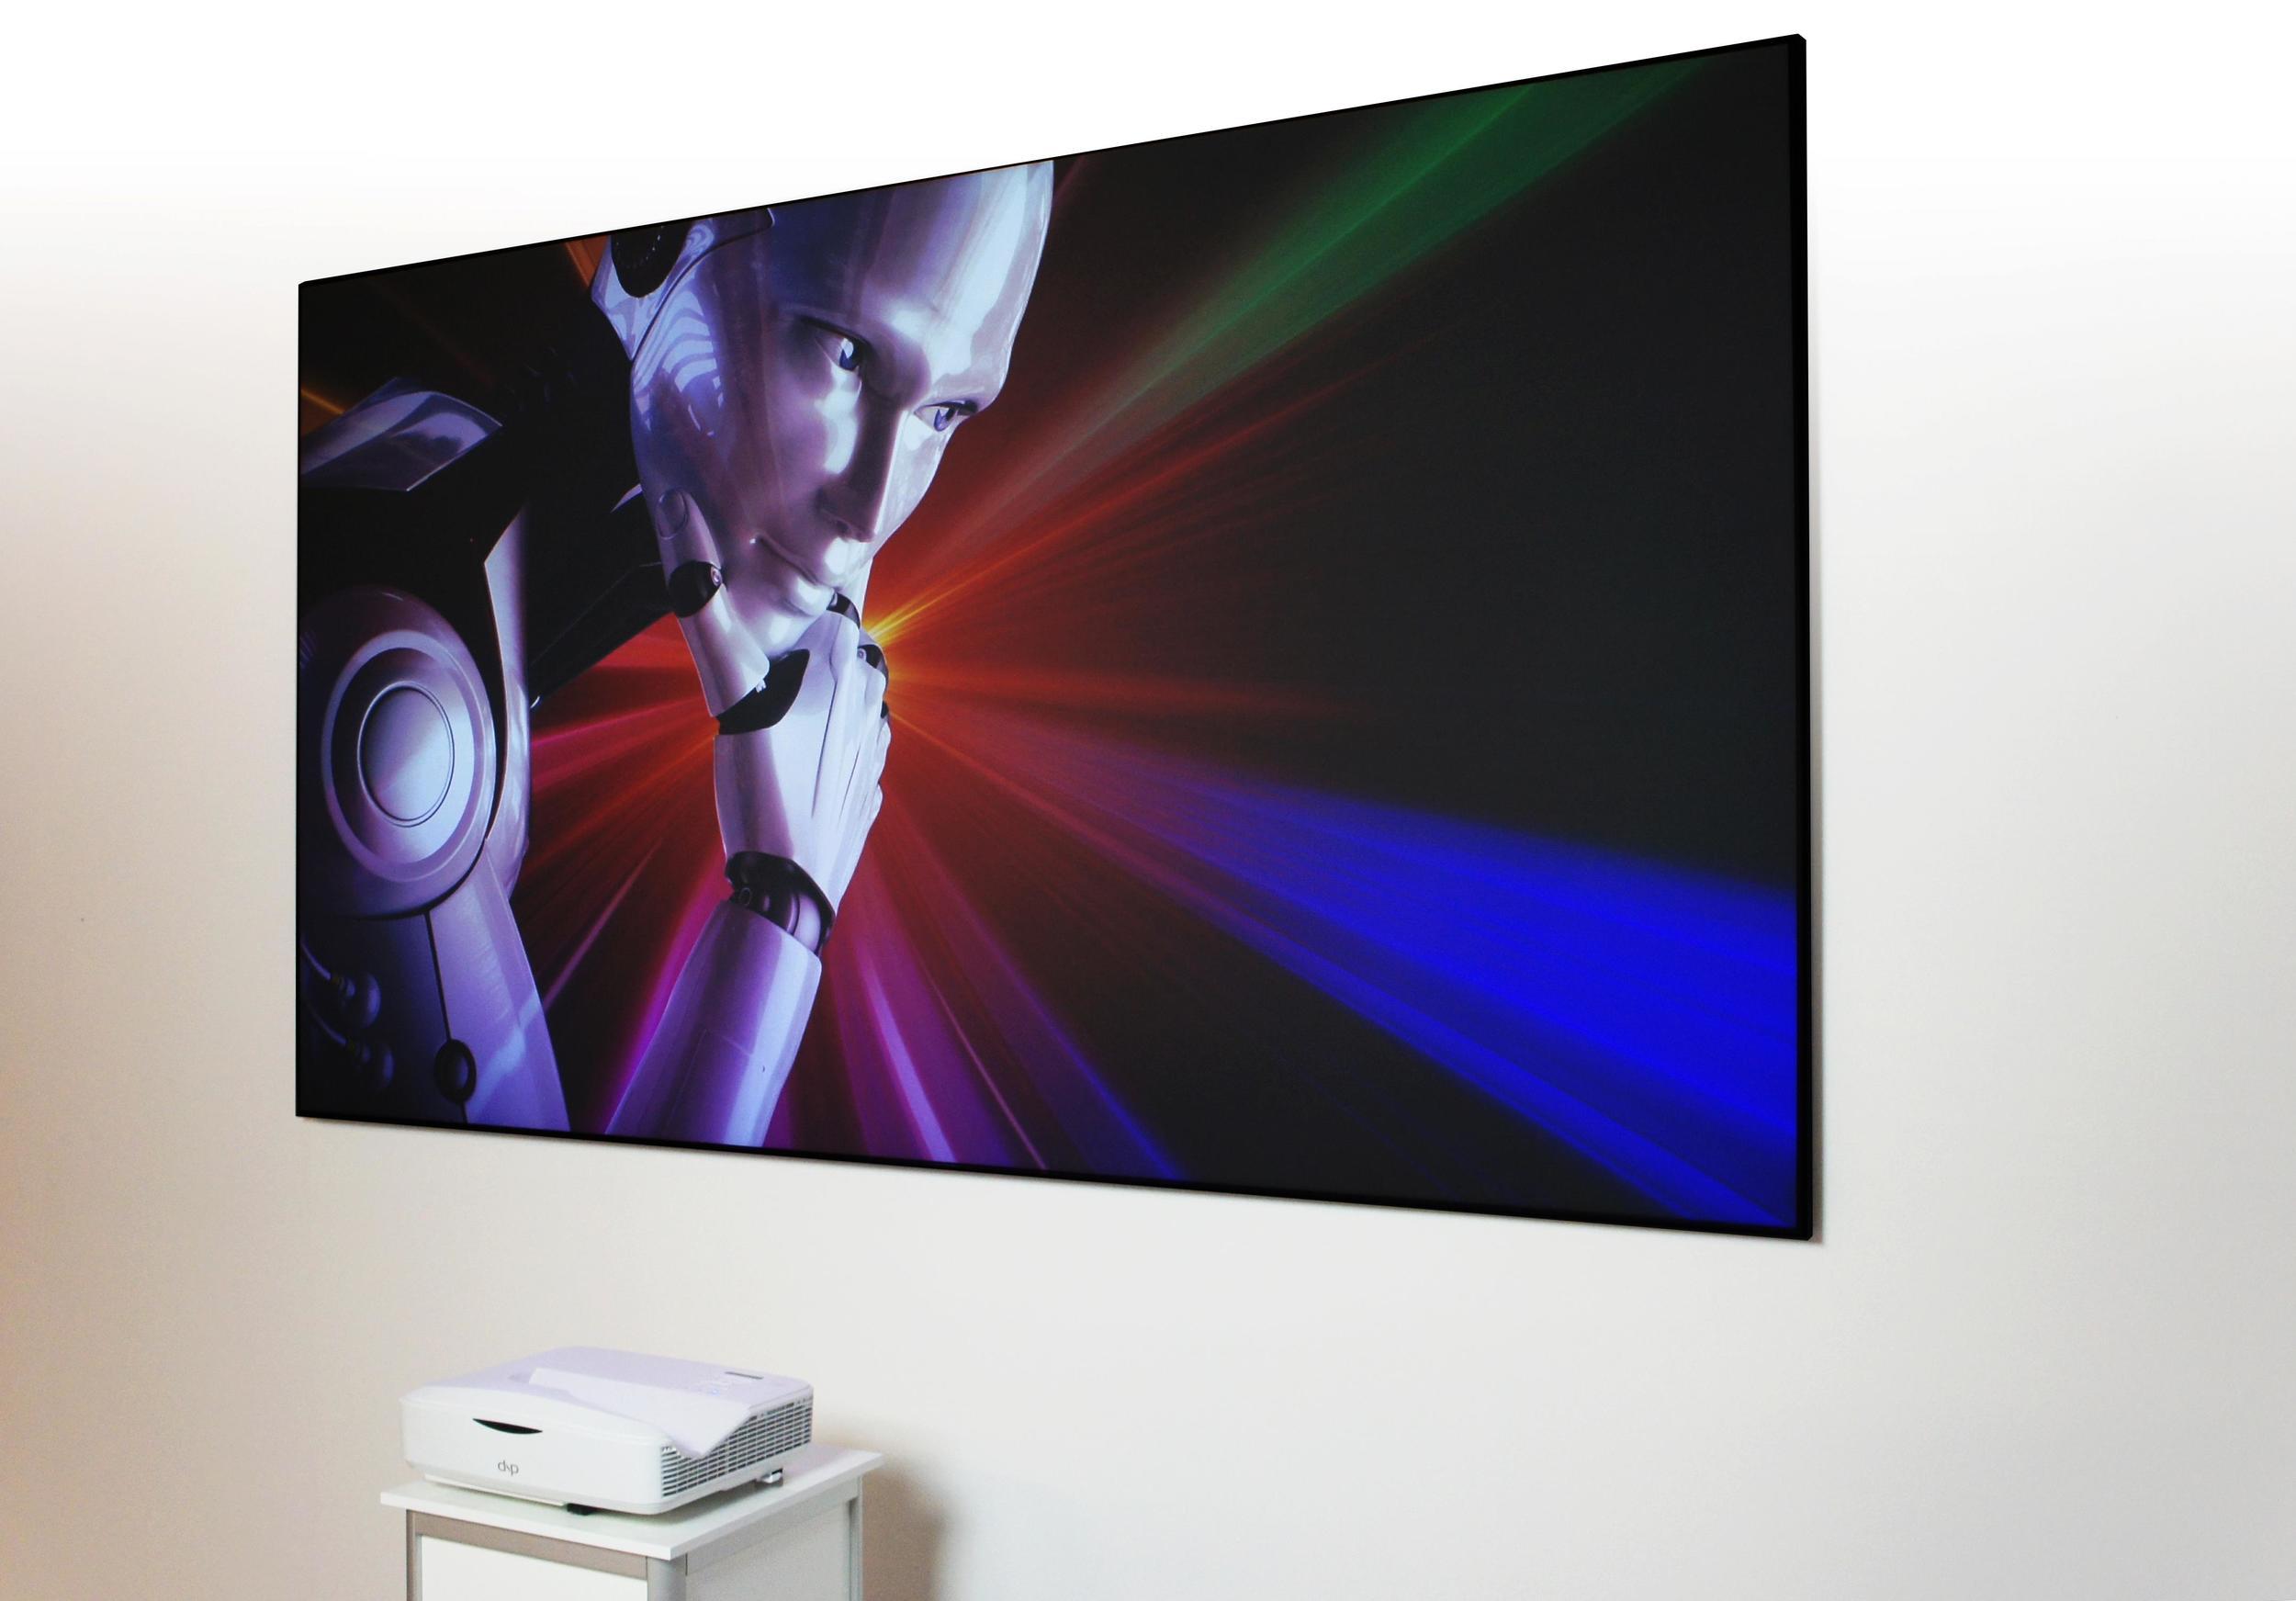 dnp LaserPanel - projector below